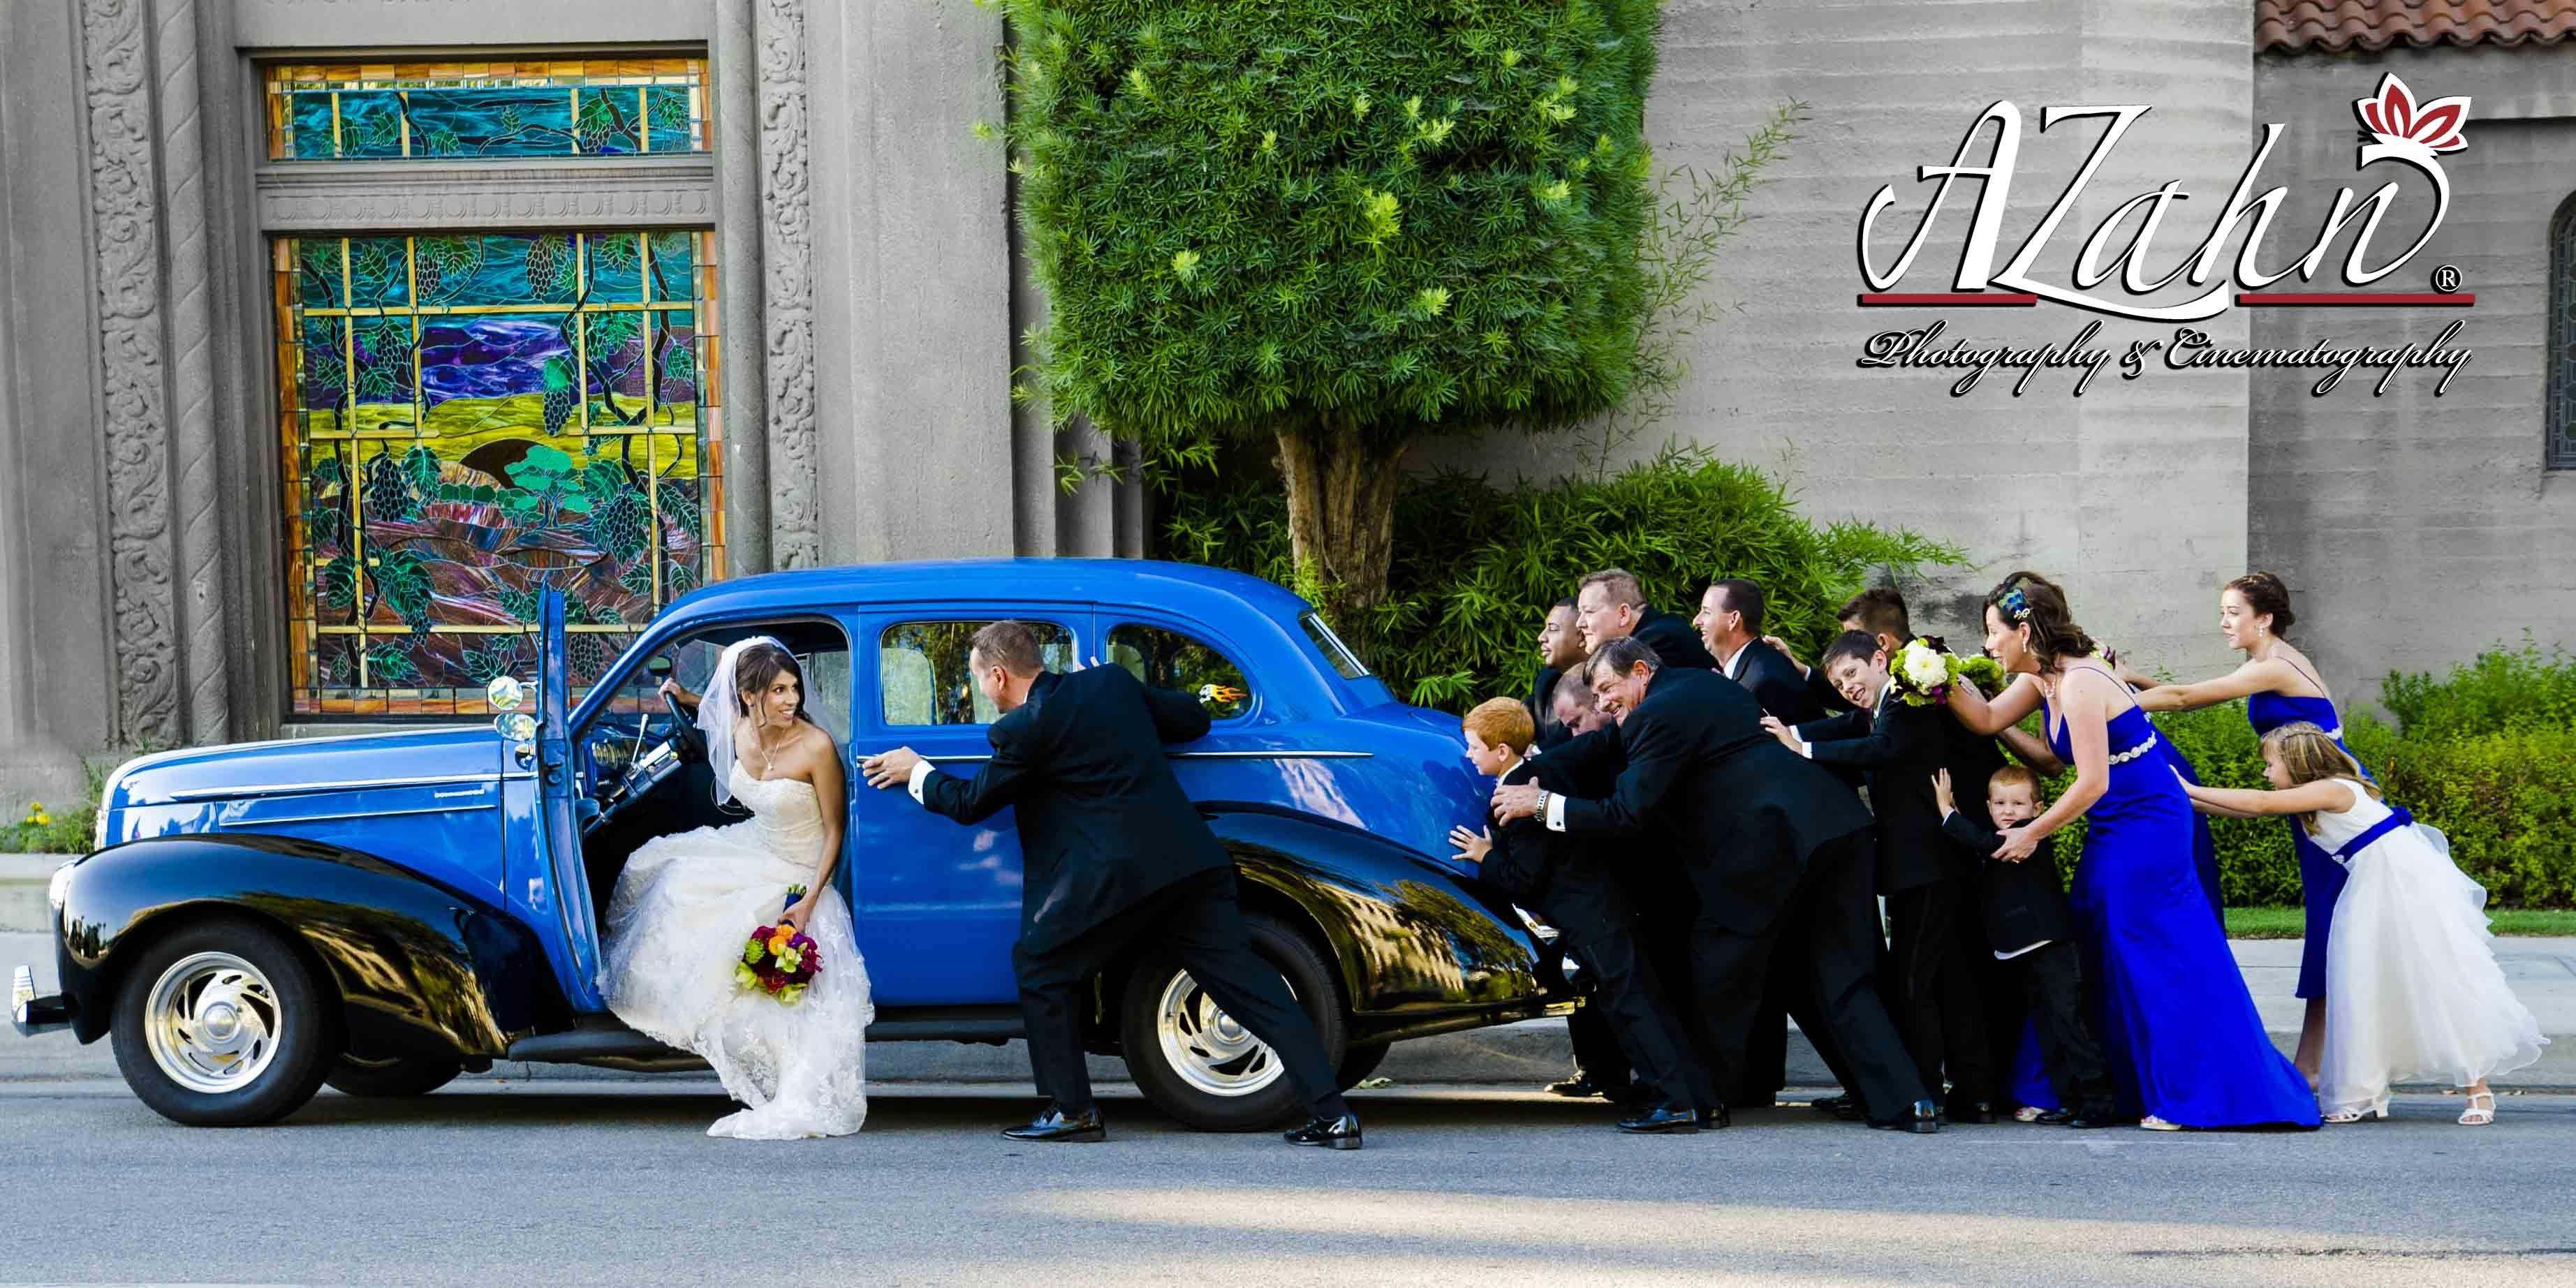 Azahn Photography Cinematography Wedding Photography Bell